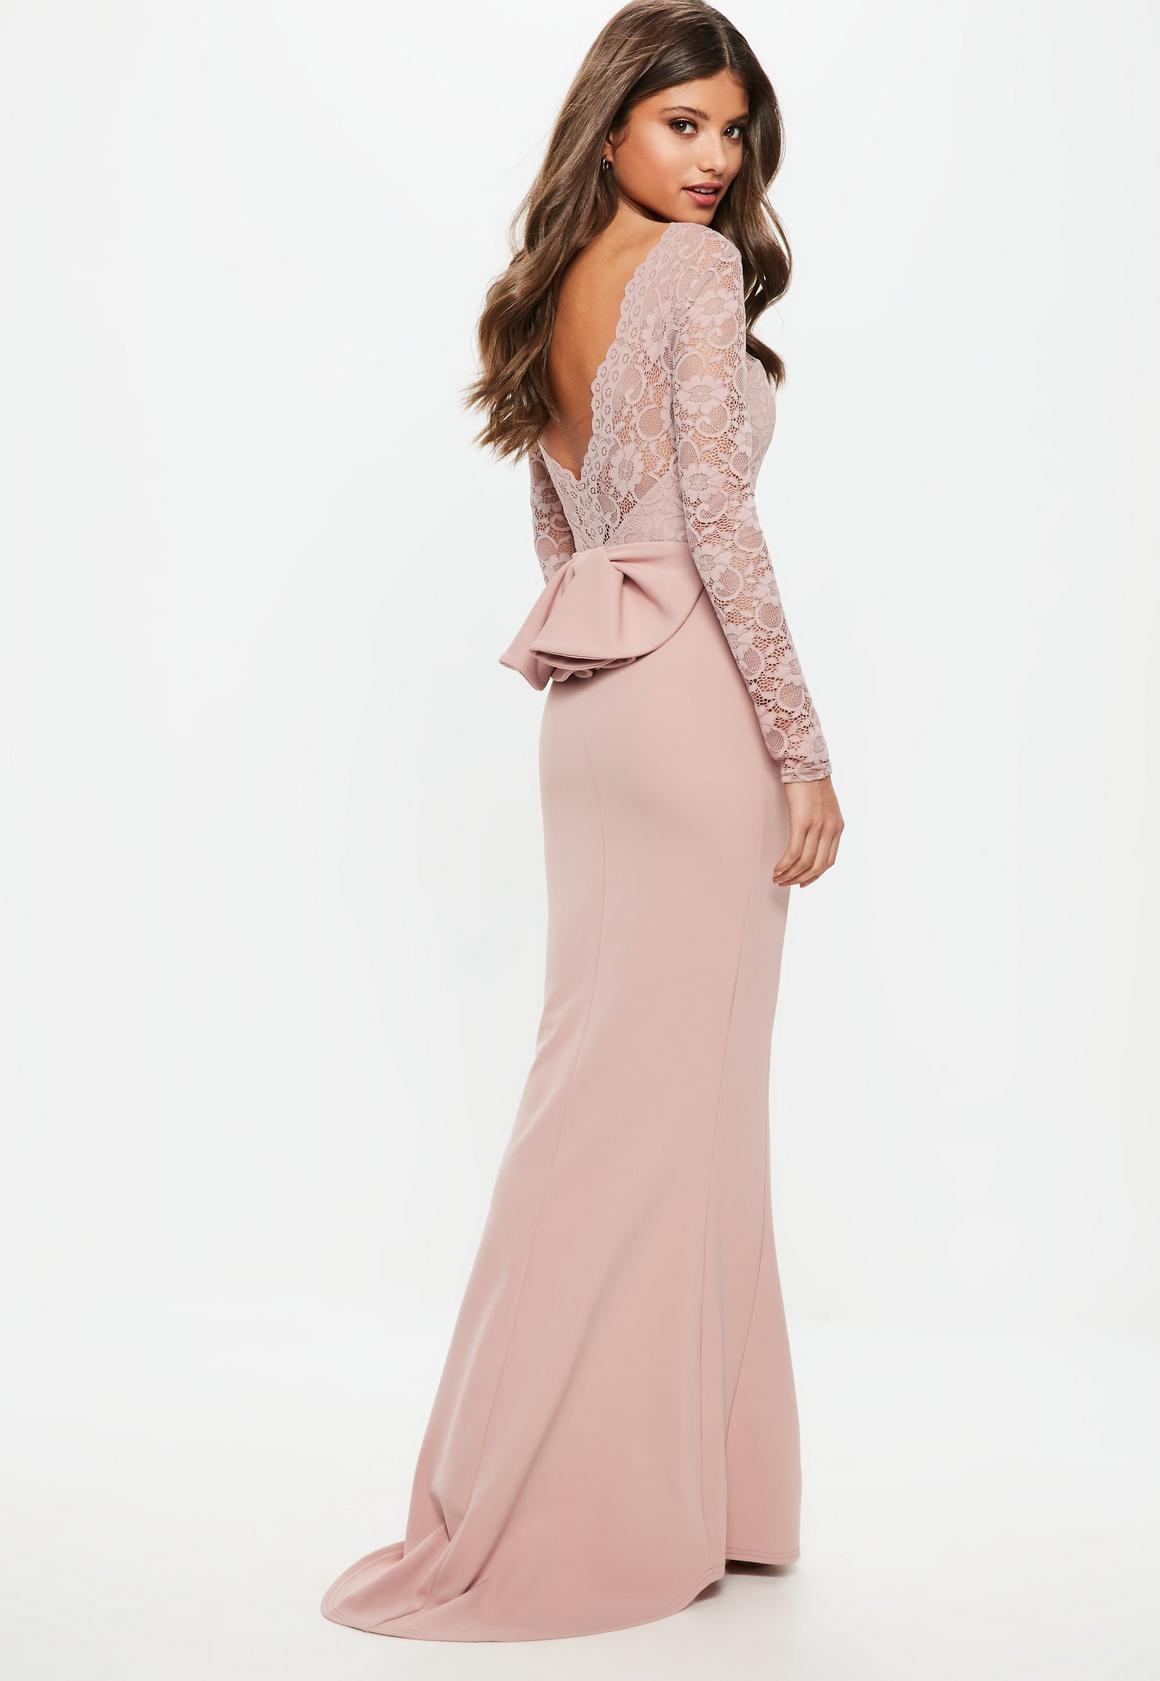 Form Fitting Maxi Dresses